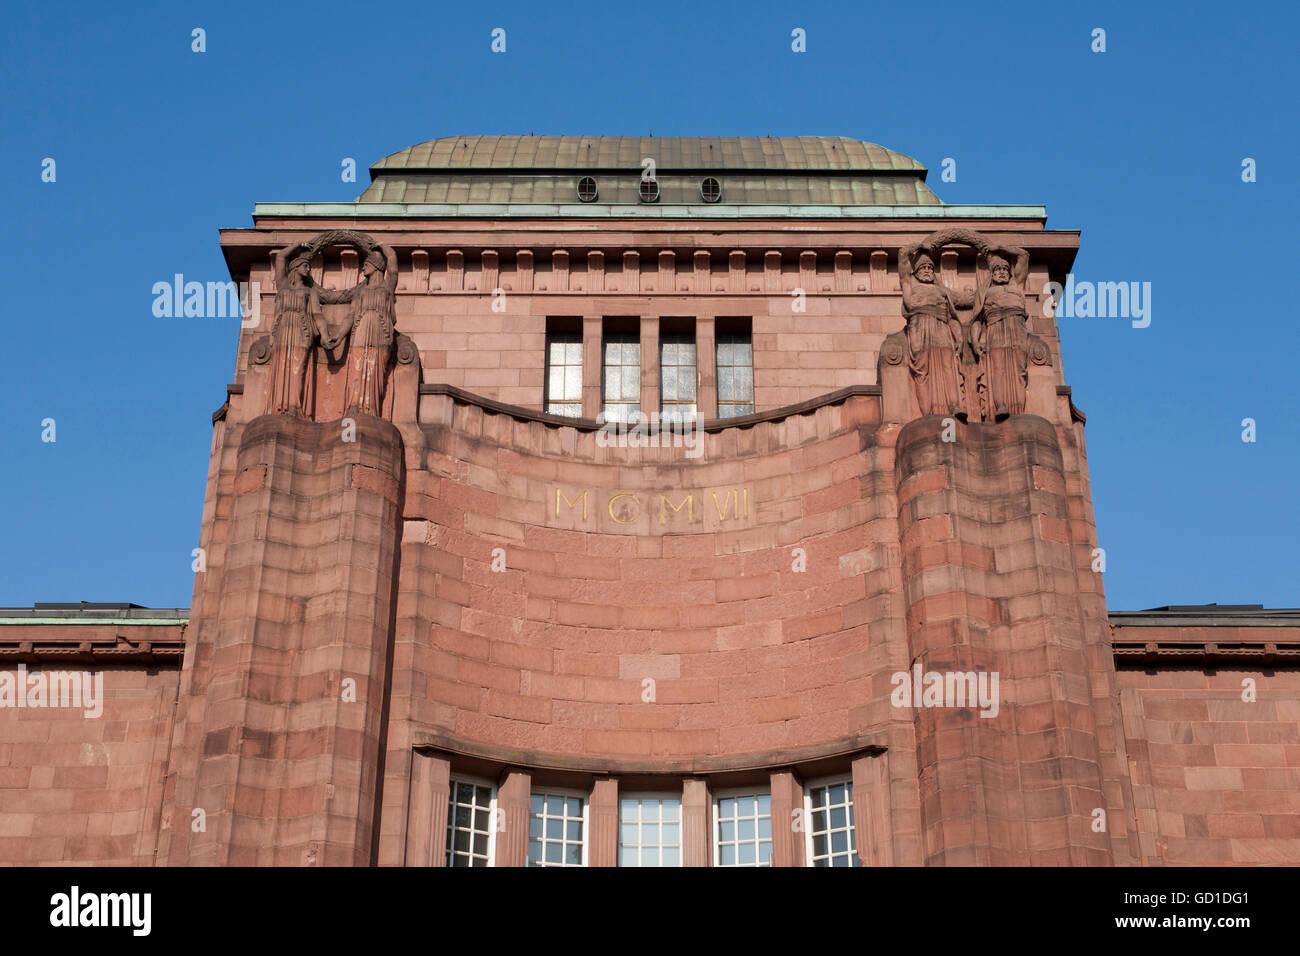 La Kunsthalle museo d'arte dal 1907, Art Nouveau, Mannheim, Baden-Wuerttemberg Immagini Stock